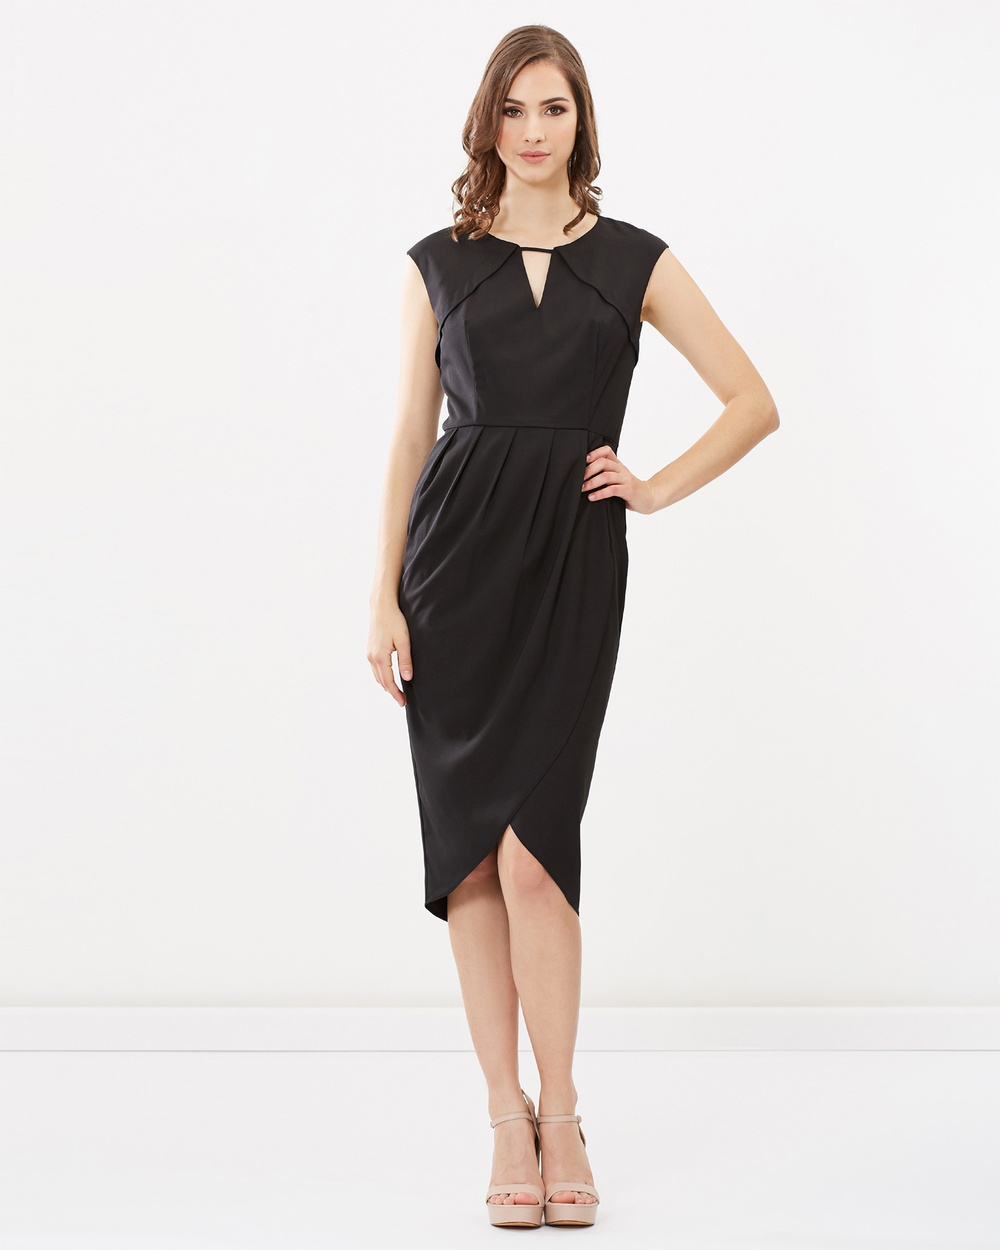 Pink Ruby Seabreeze Cut Out Dress Dresses Black Seabreeze Cut-Out Dress